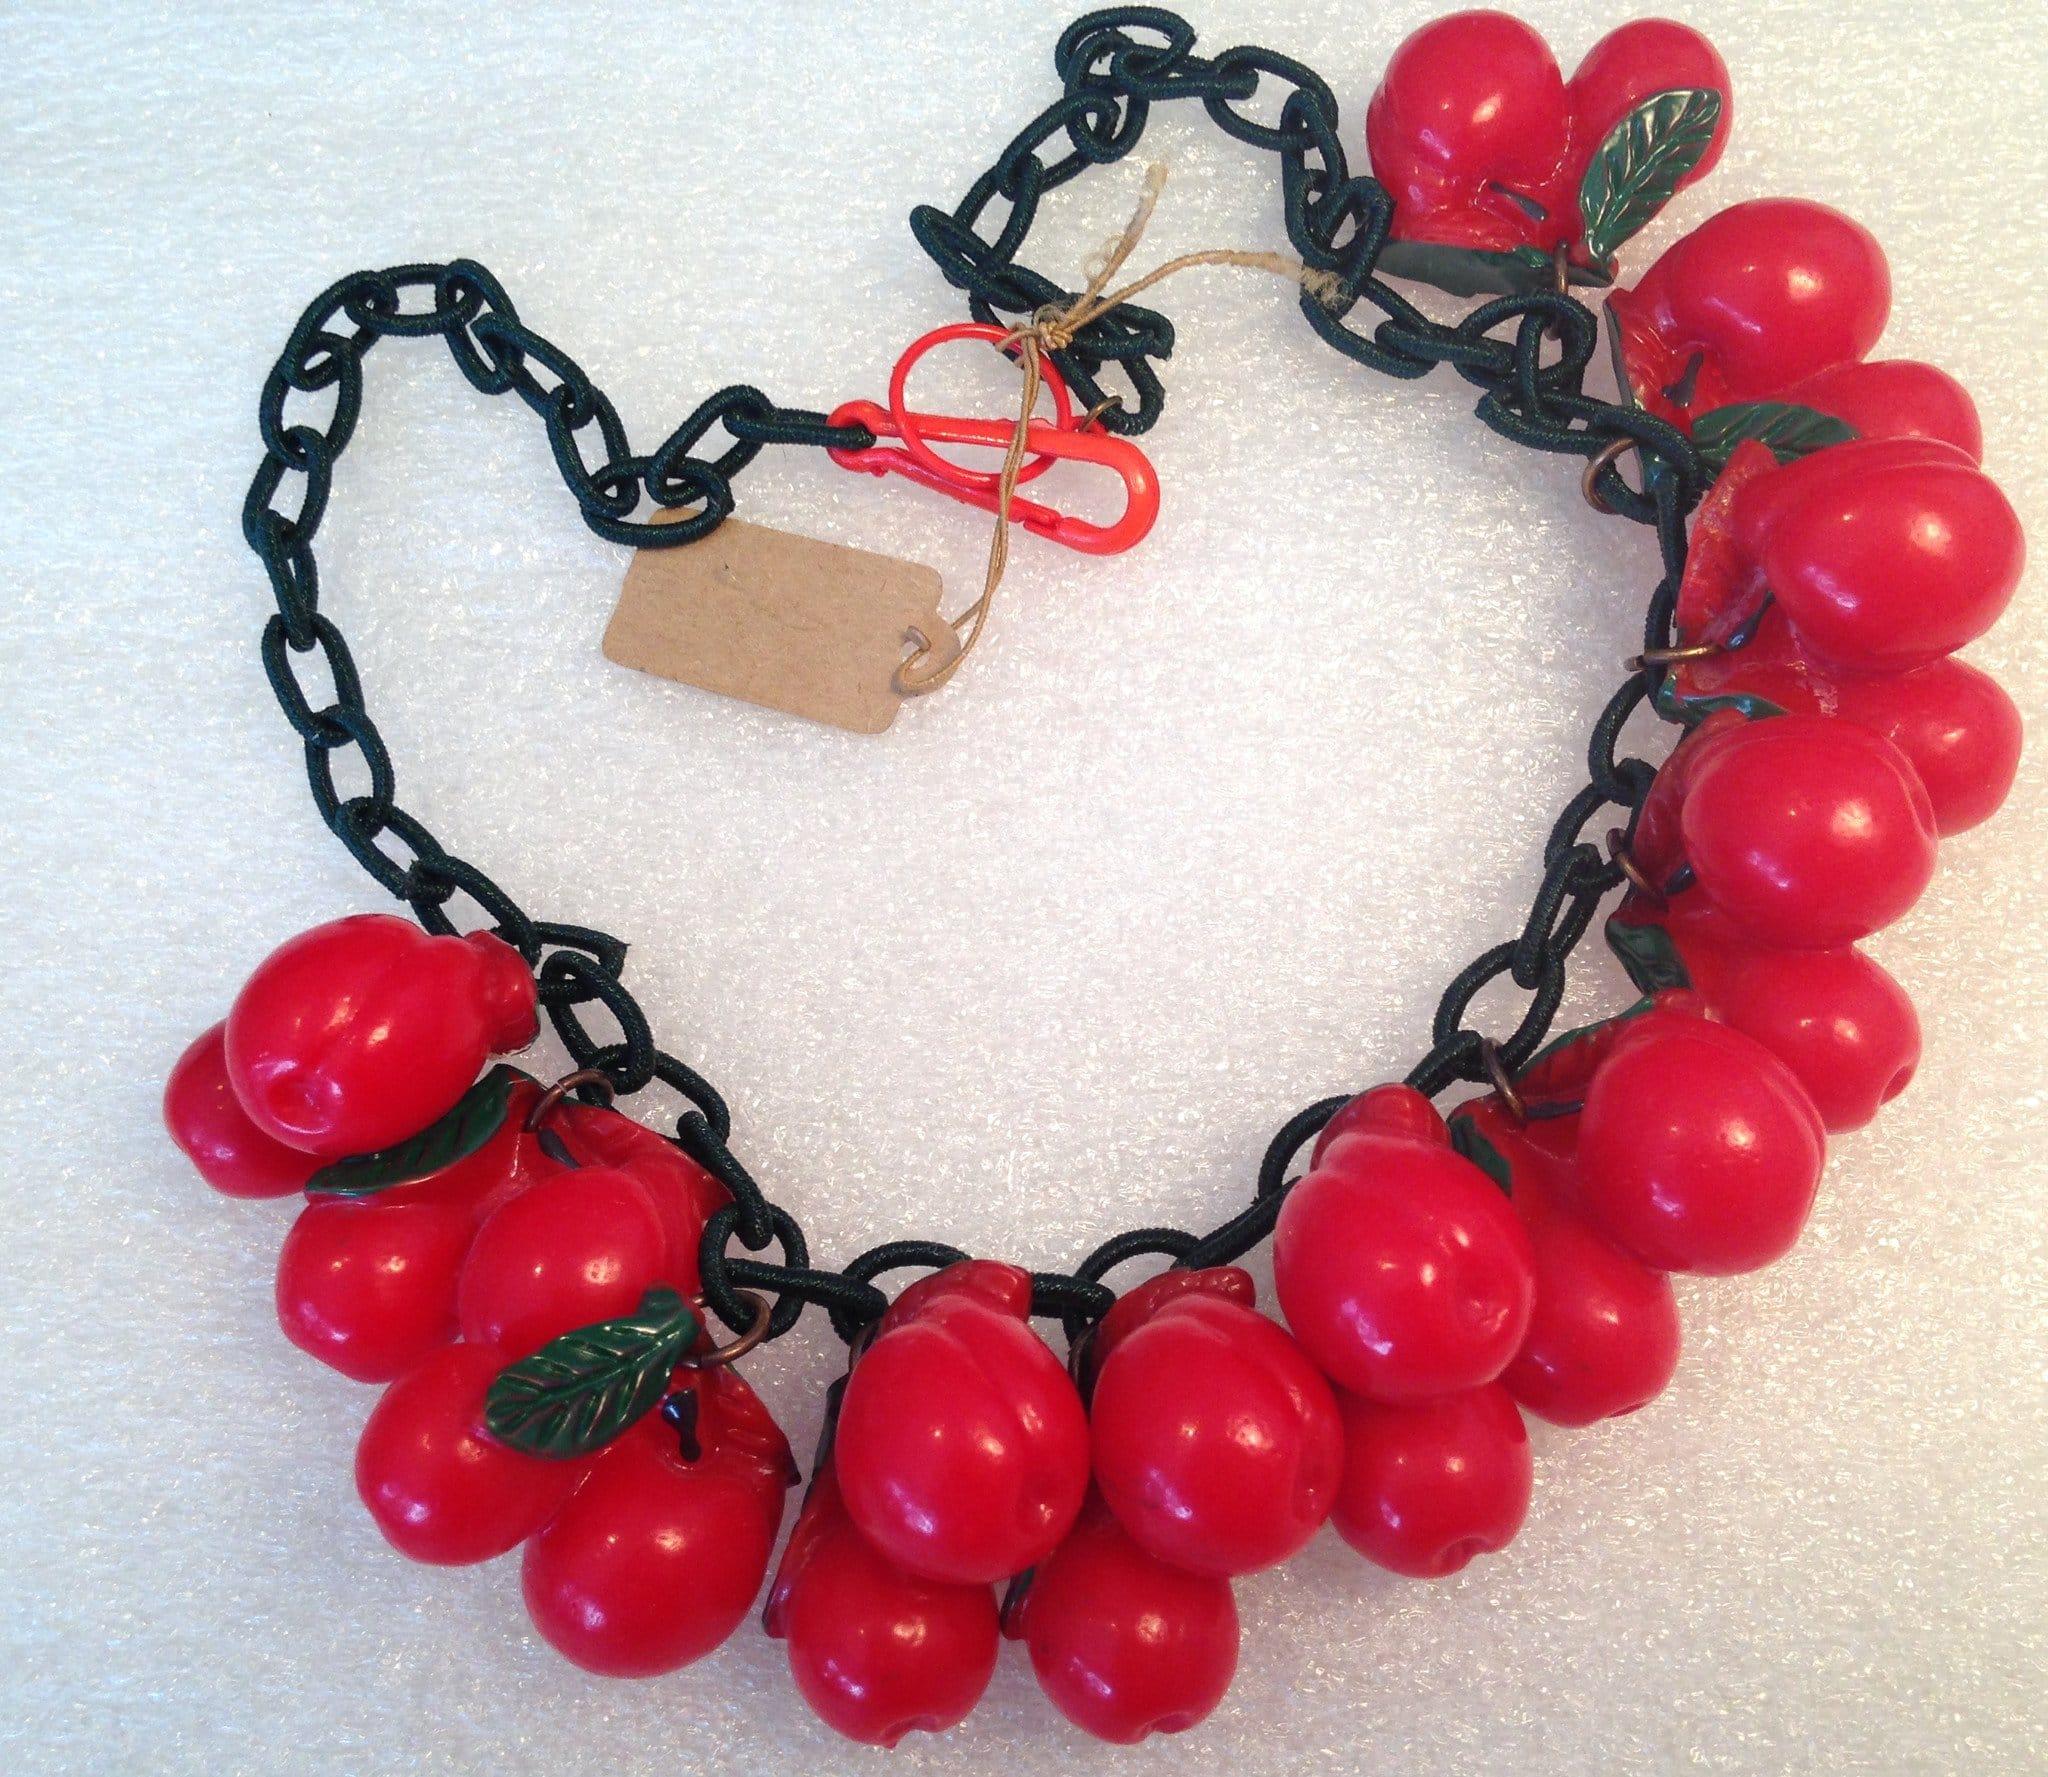 Vintage style plastic cherries necklace